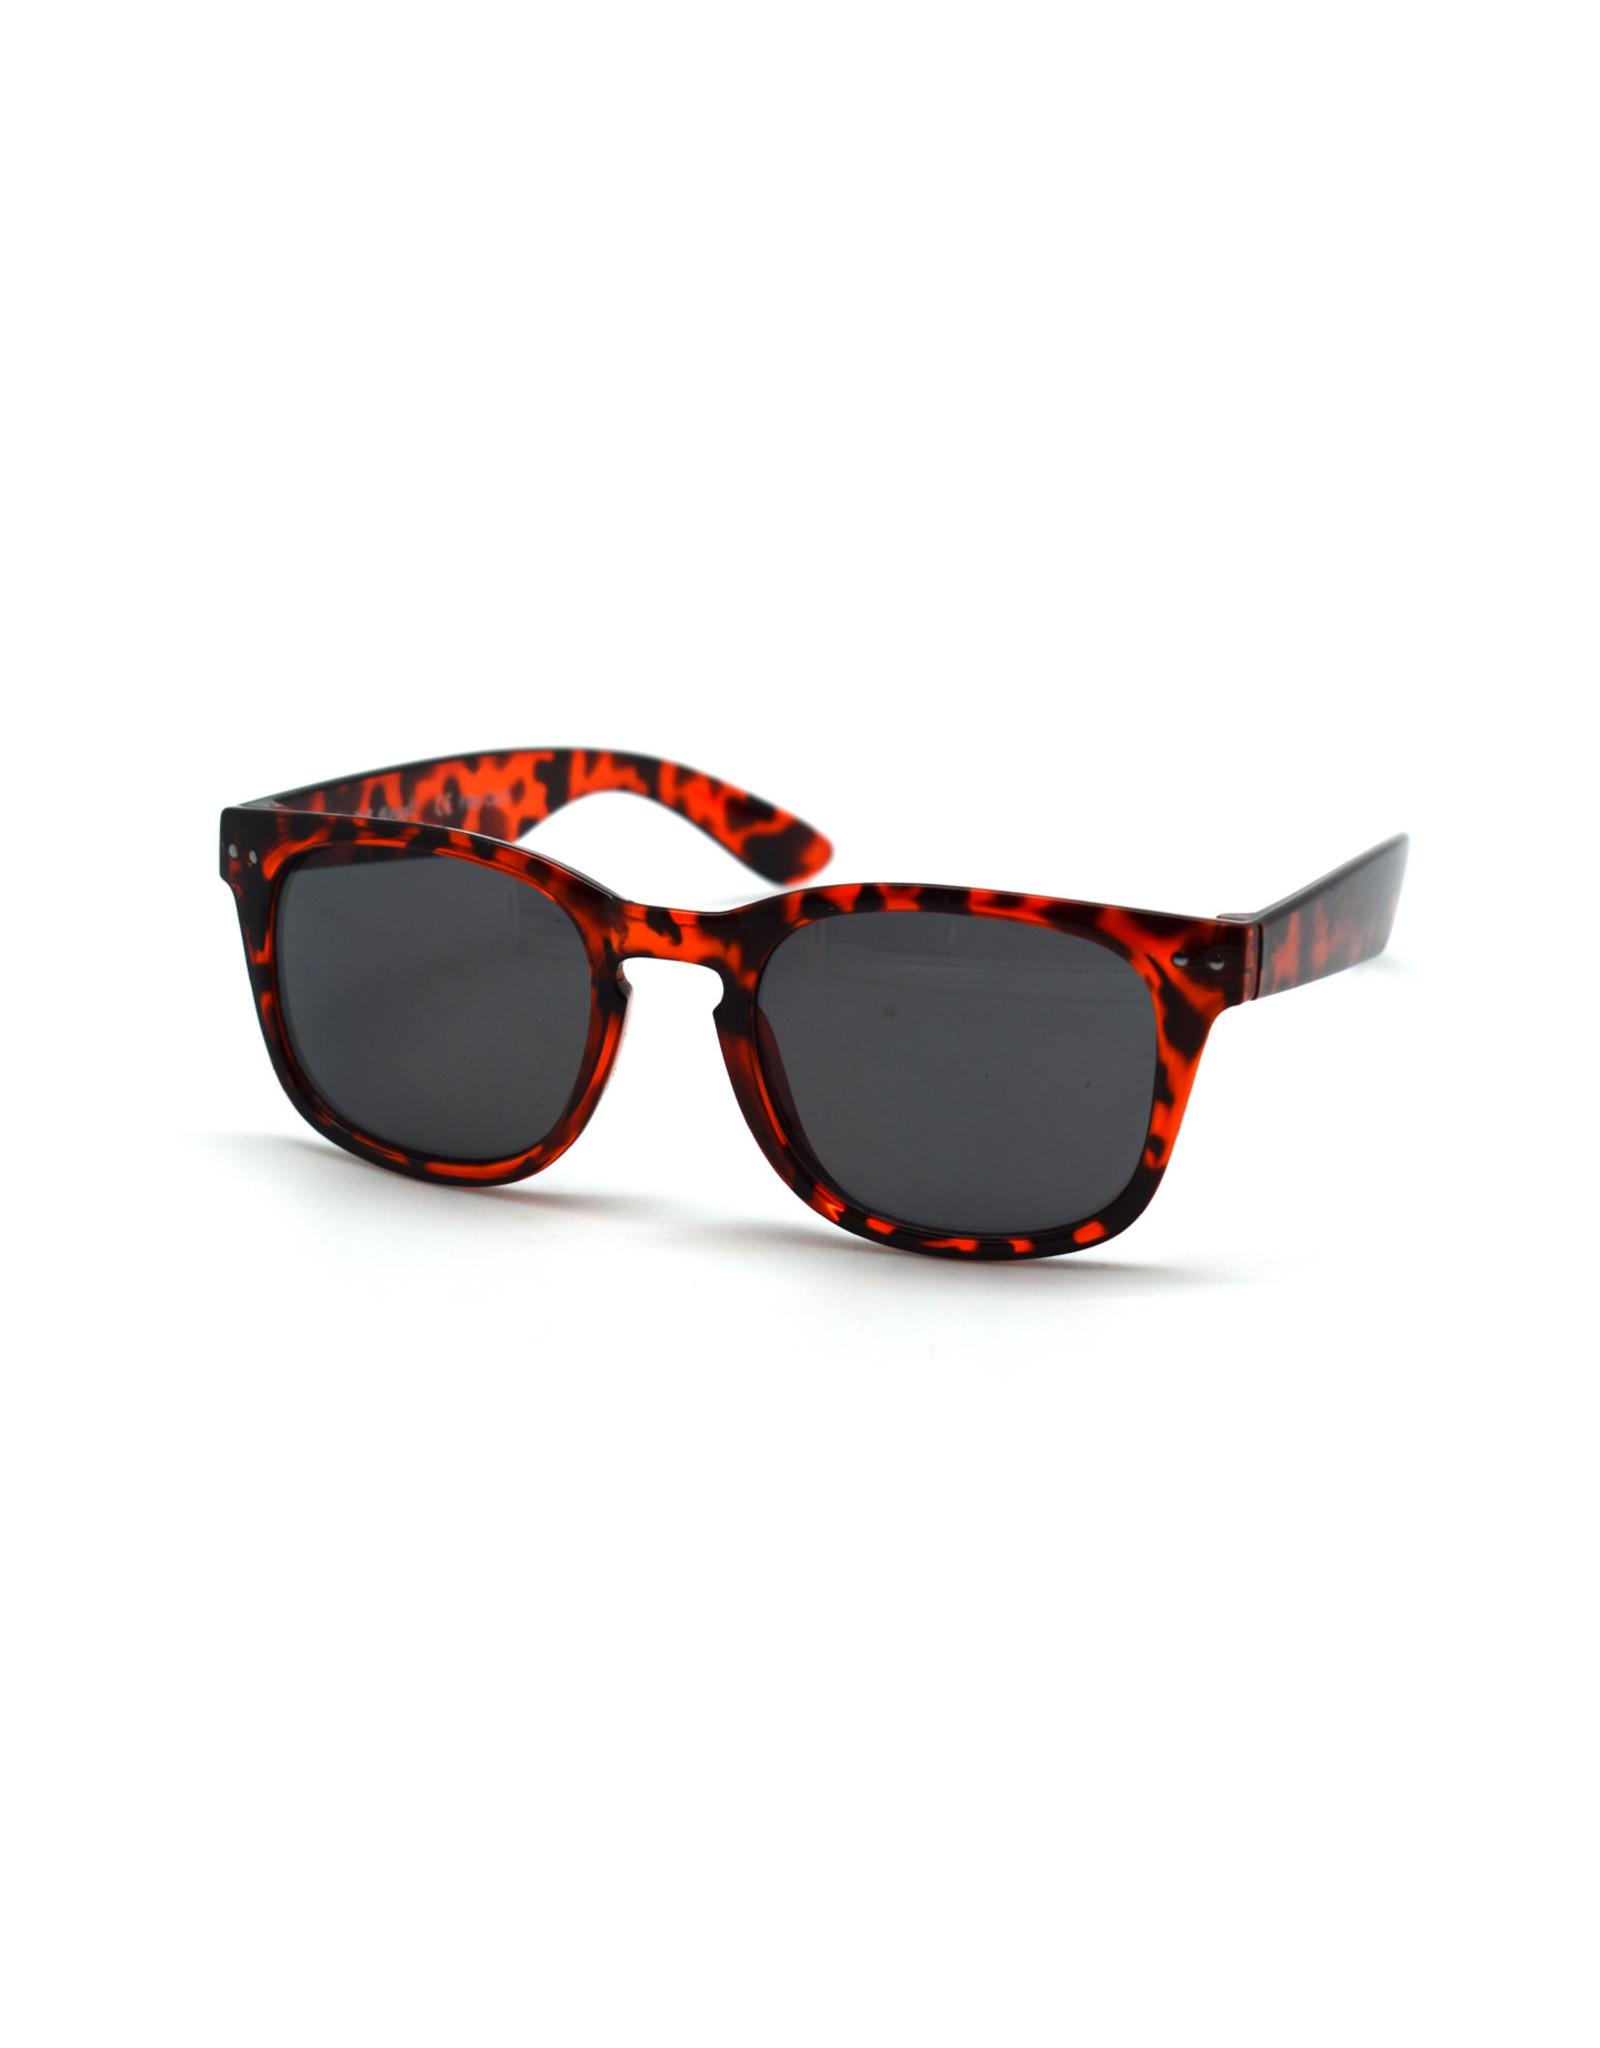 Red Leopard Sunglasses